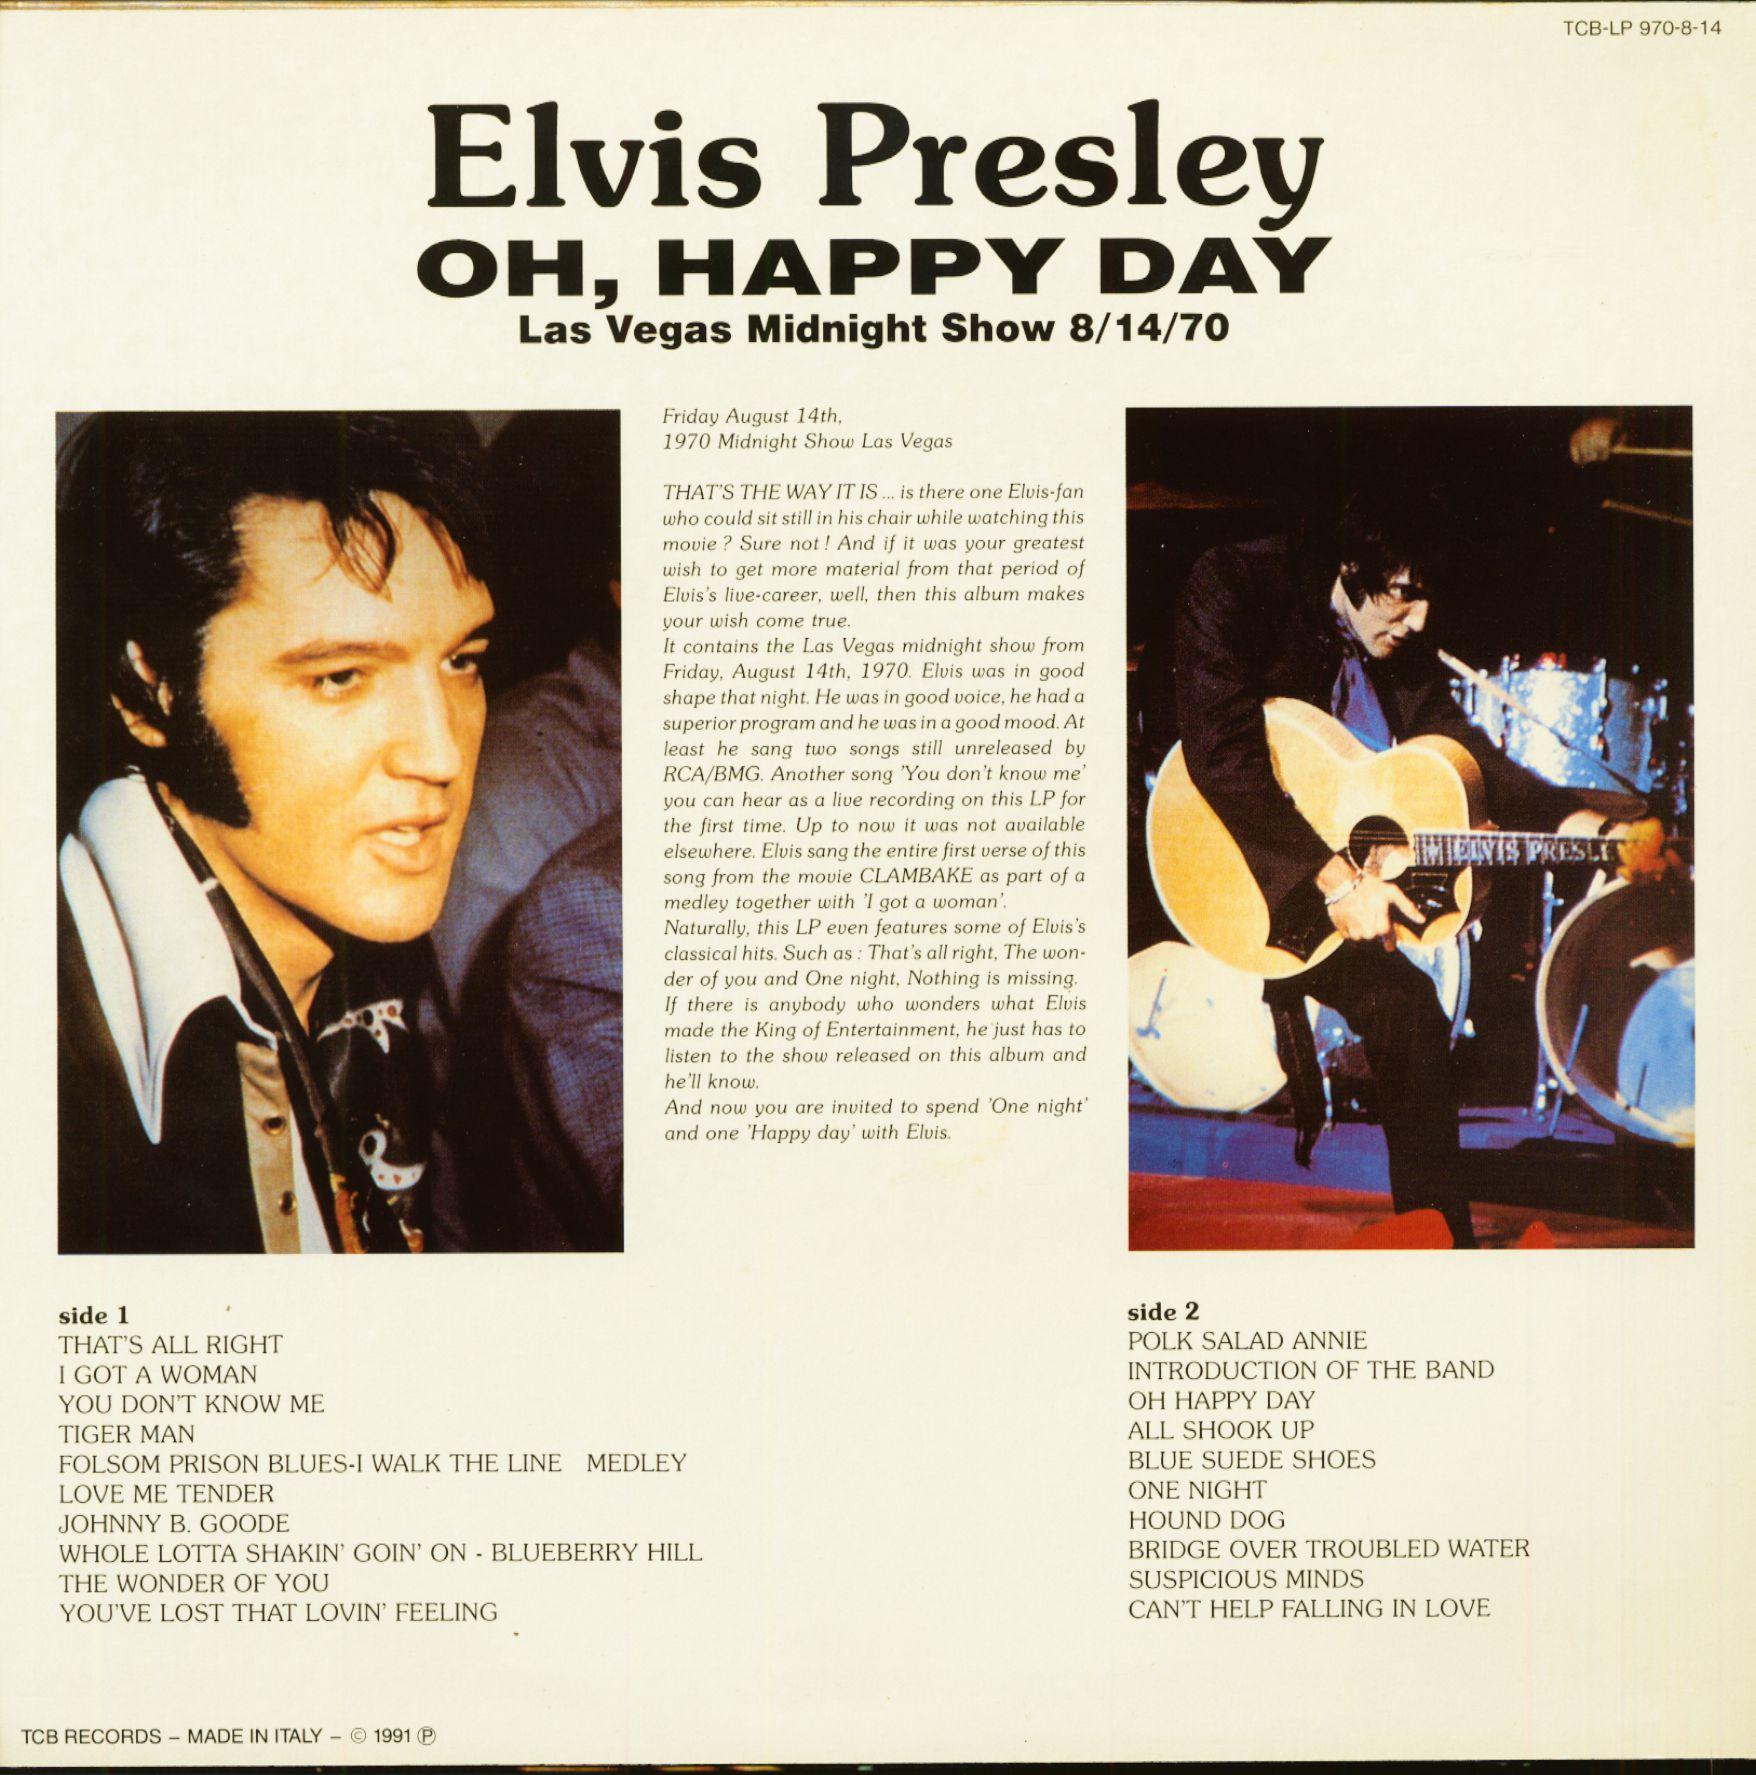 Elvis Presley LP: Oh, Happy Day - Las Vegas Midnight Show